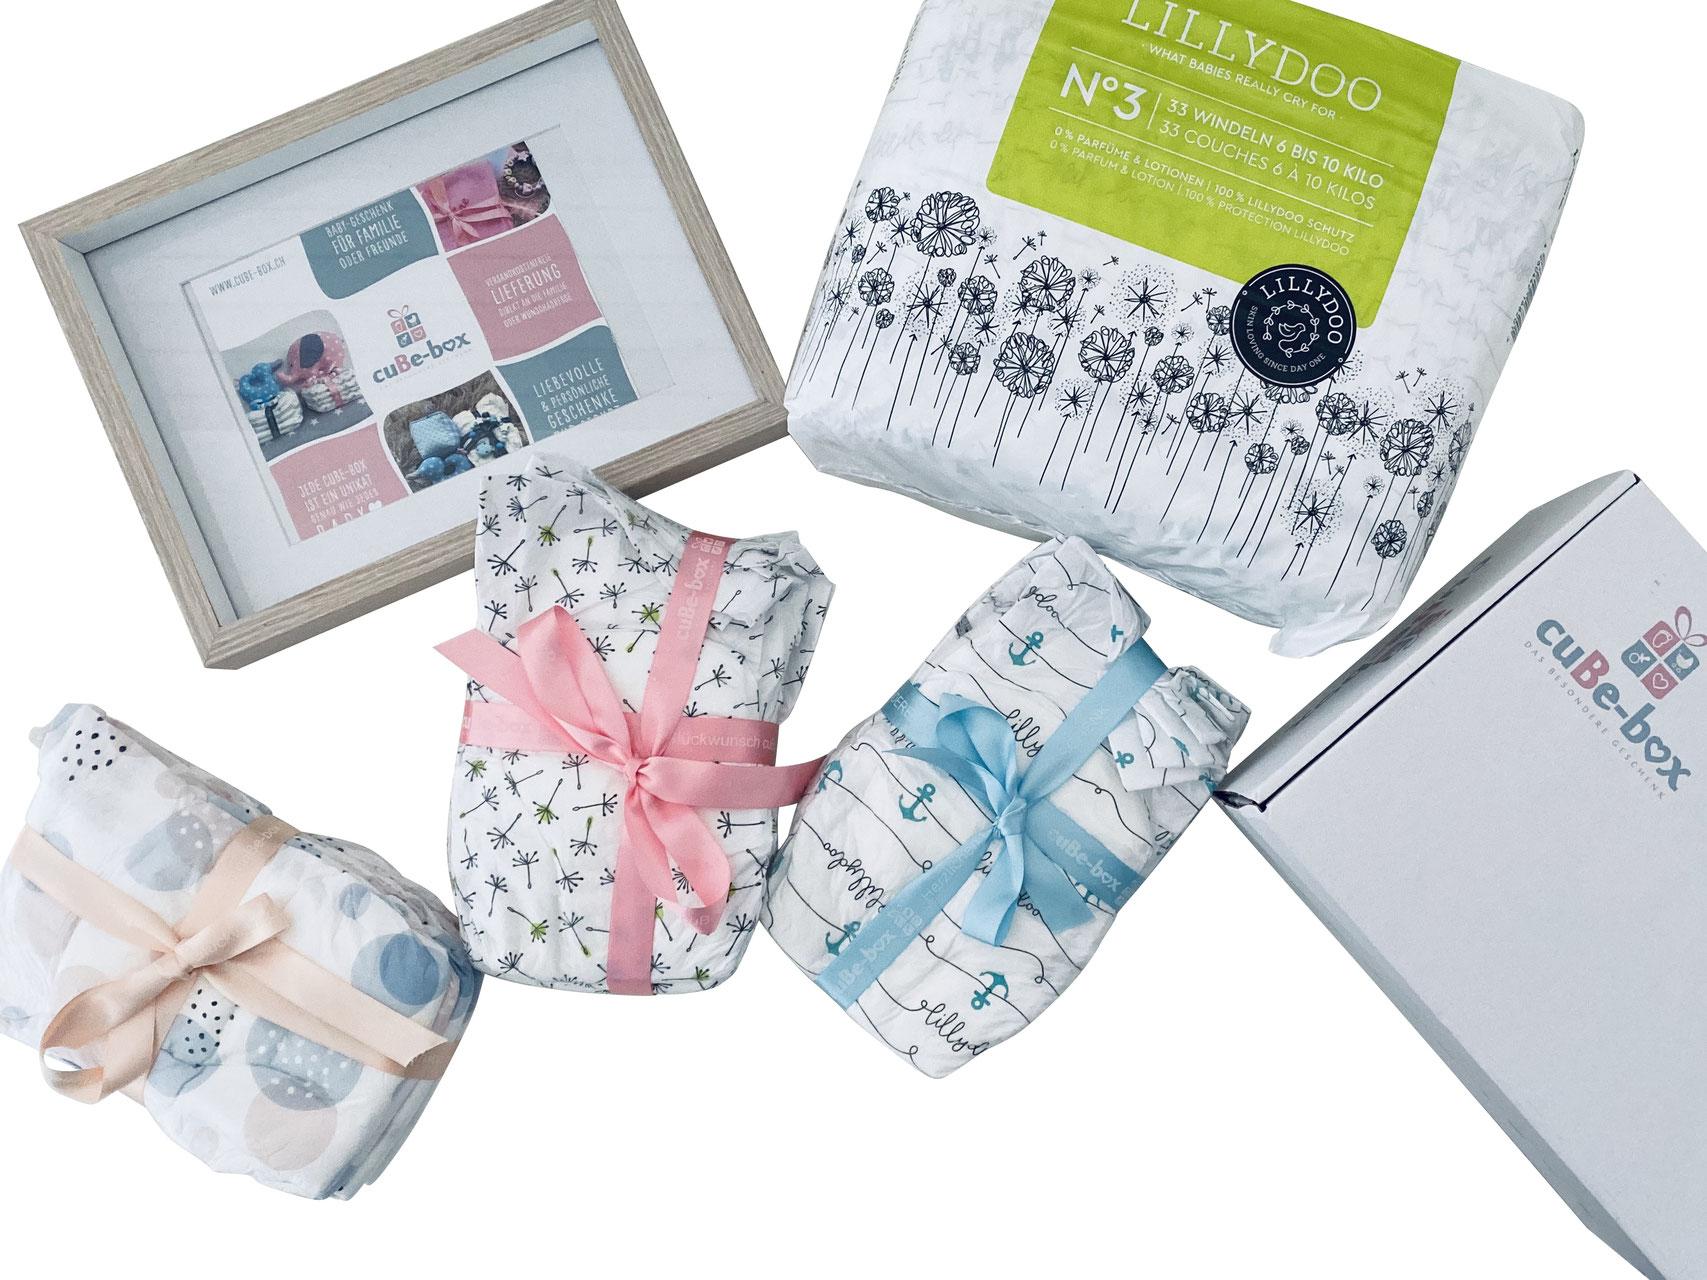 cuBe-box Babygeschenke nuscheli